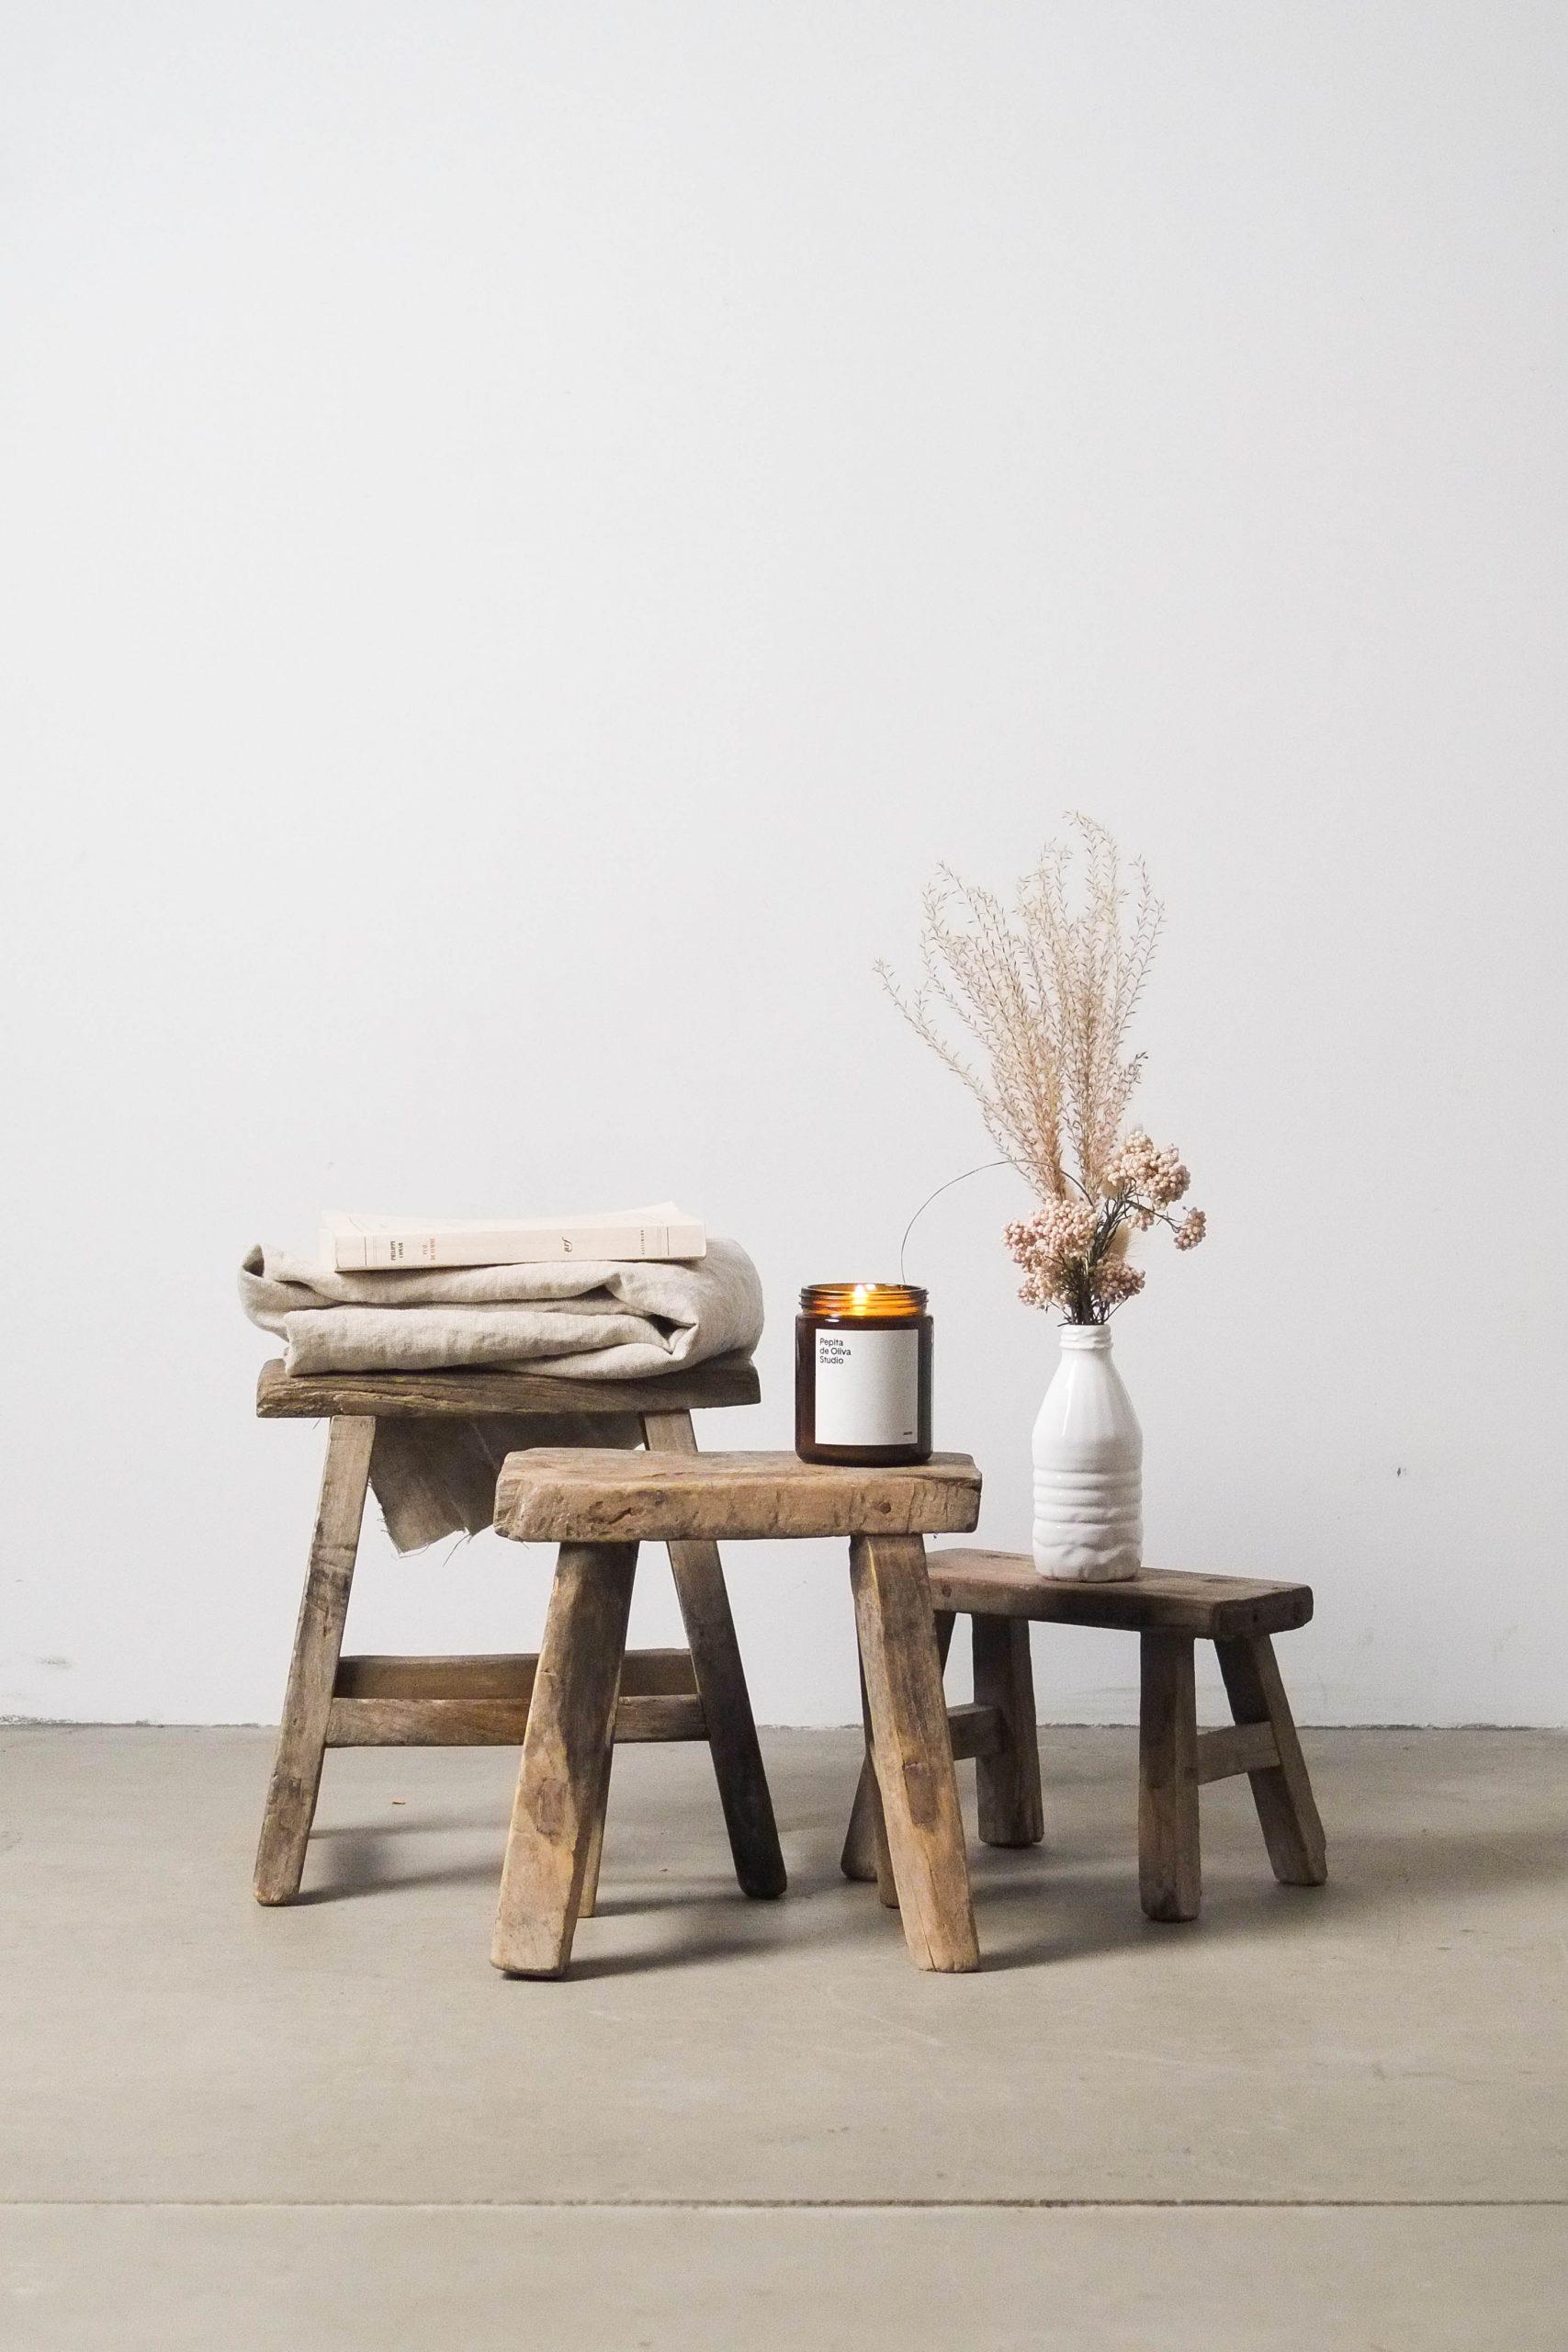 vela de diseño de calidad aromatica fabricada a mano artesana